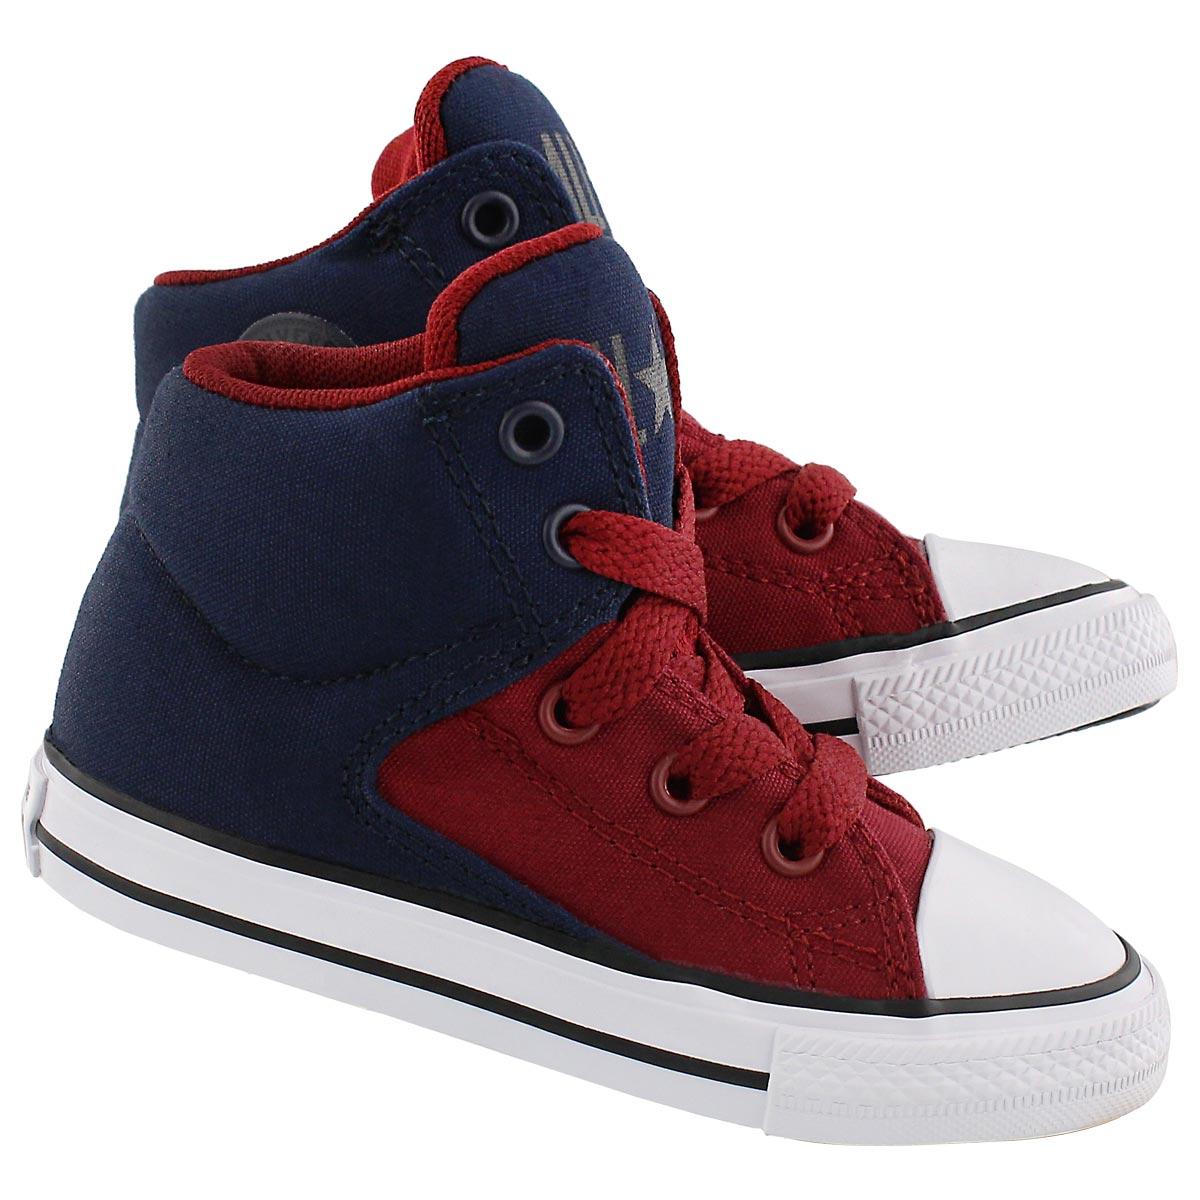 Infs HighStreetHi obsidian/red sneaker